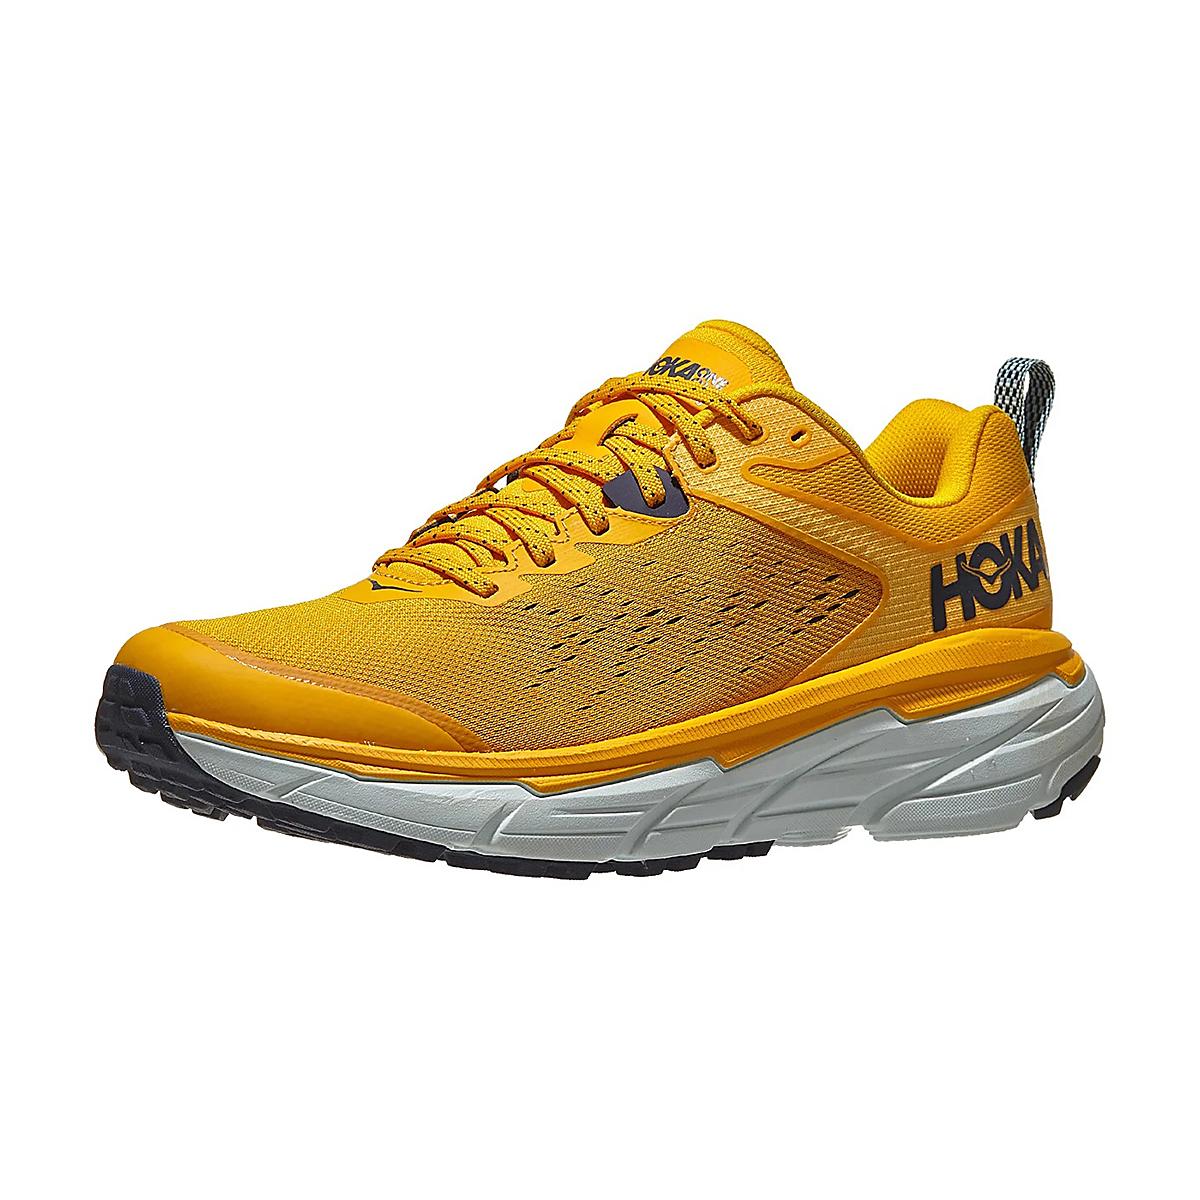 Men's Hoka One One Challenger ATR 6 Running Shoe - Color: Saffron / Morning Mist - Size: 7 - Width: Regular, Saffron / Morning Mist, large, image 3